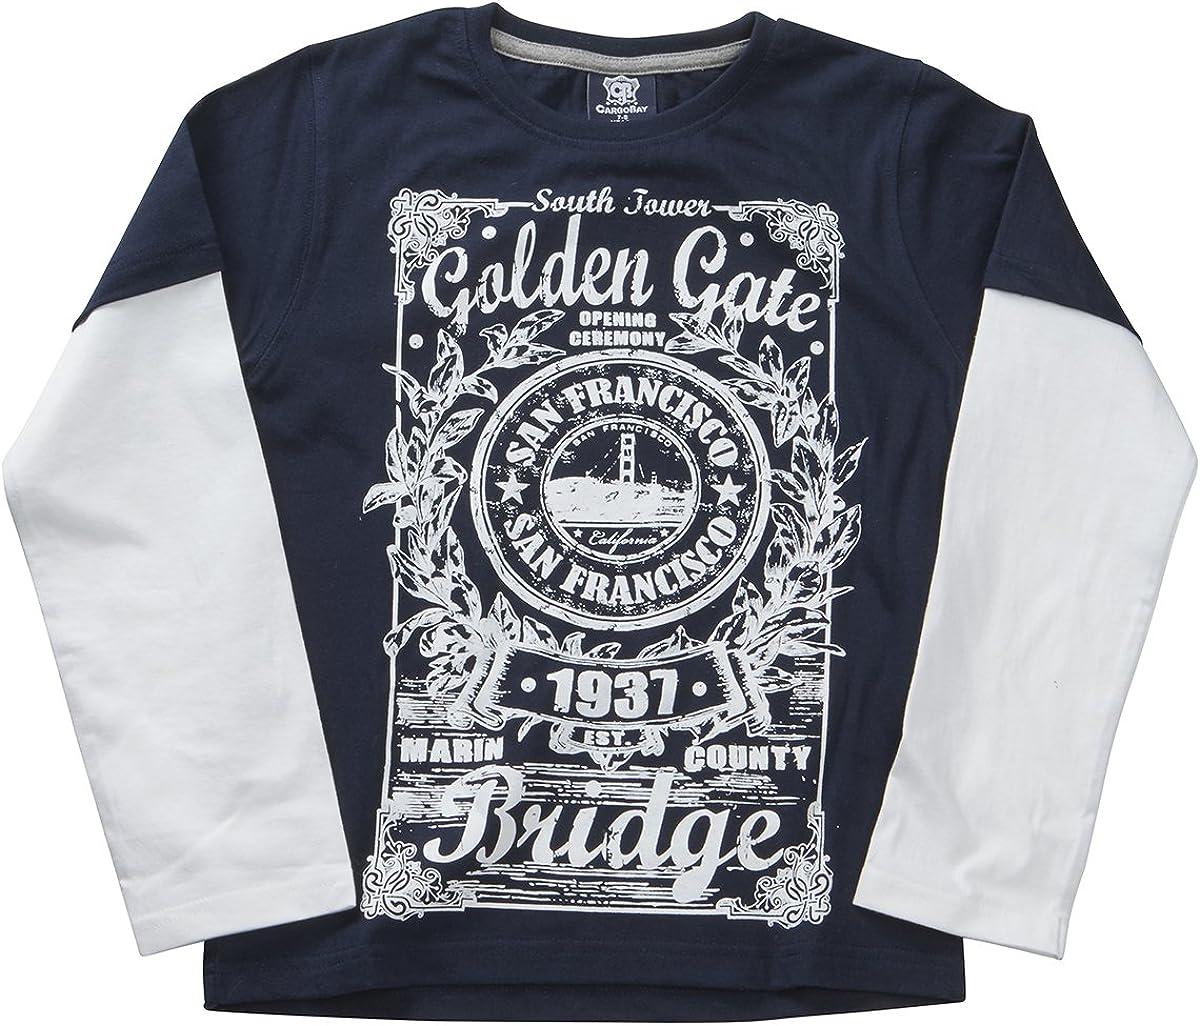 Minikidz Childrens Kids Boys Mock Long Sleeve Tshirt Printed Graphic Cotton Top Ages 7-13